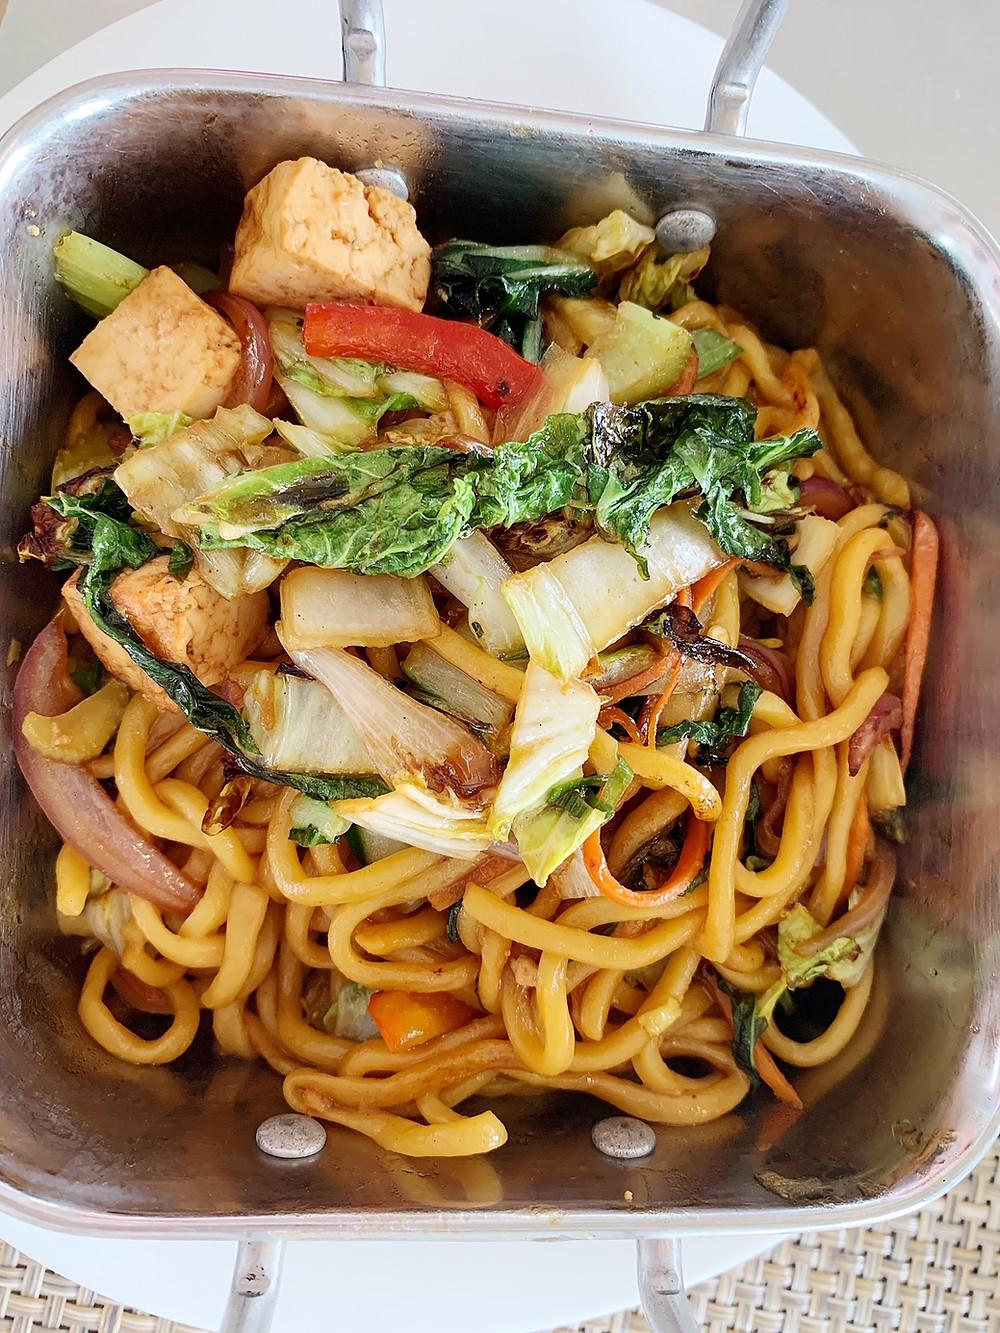 Yakisoba Stir-Fried Noodles at Pescado